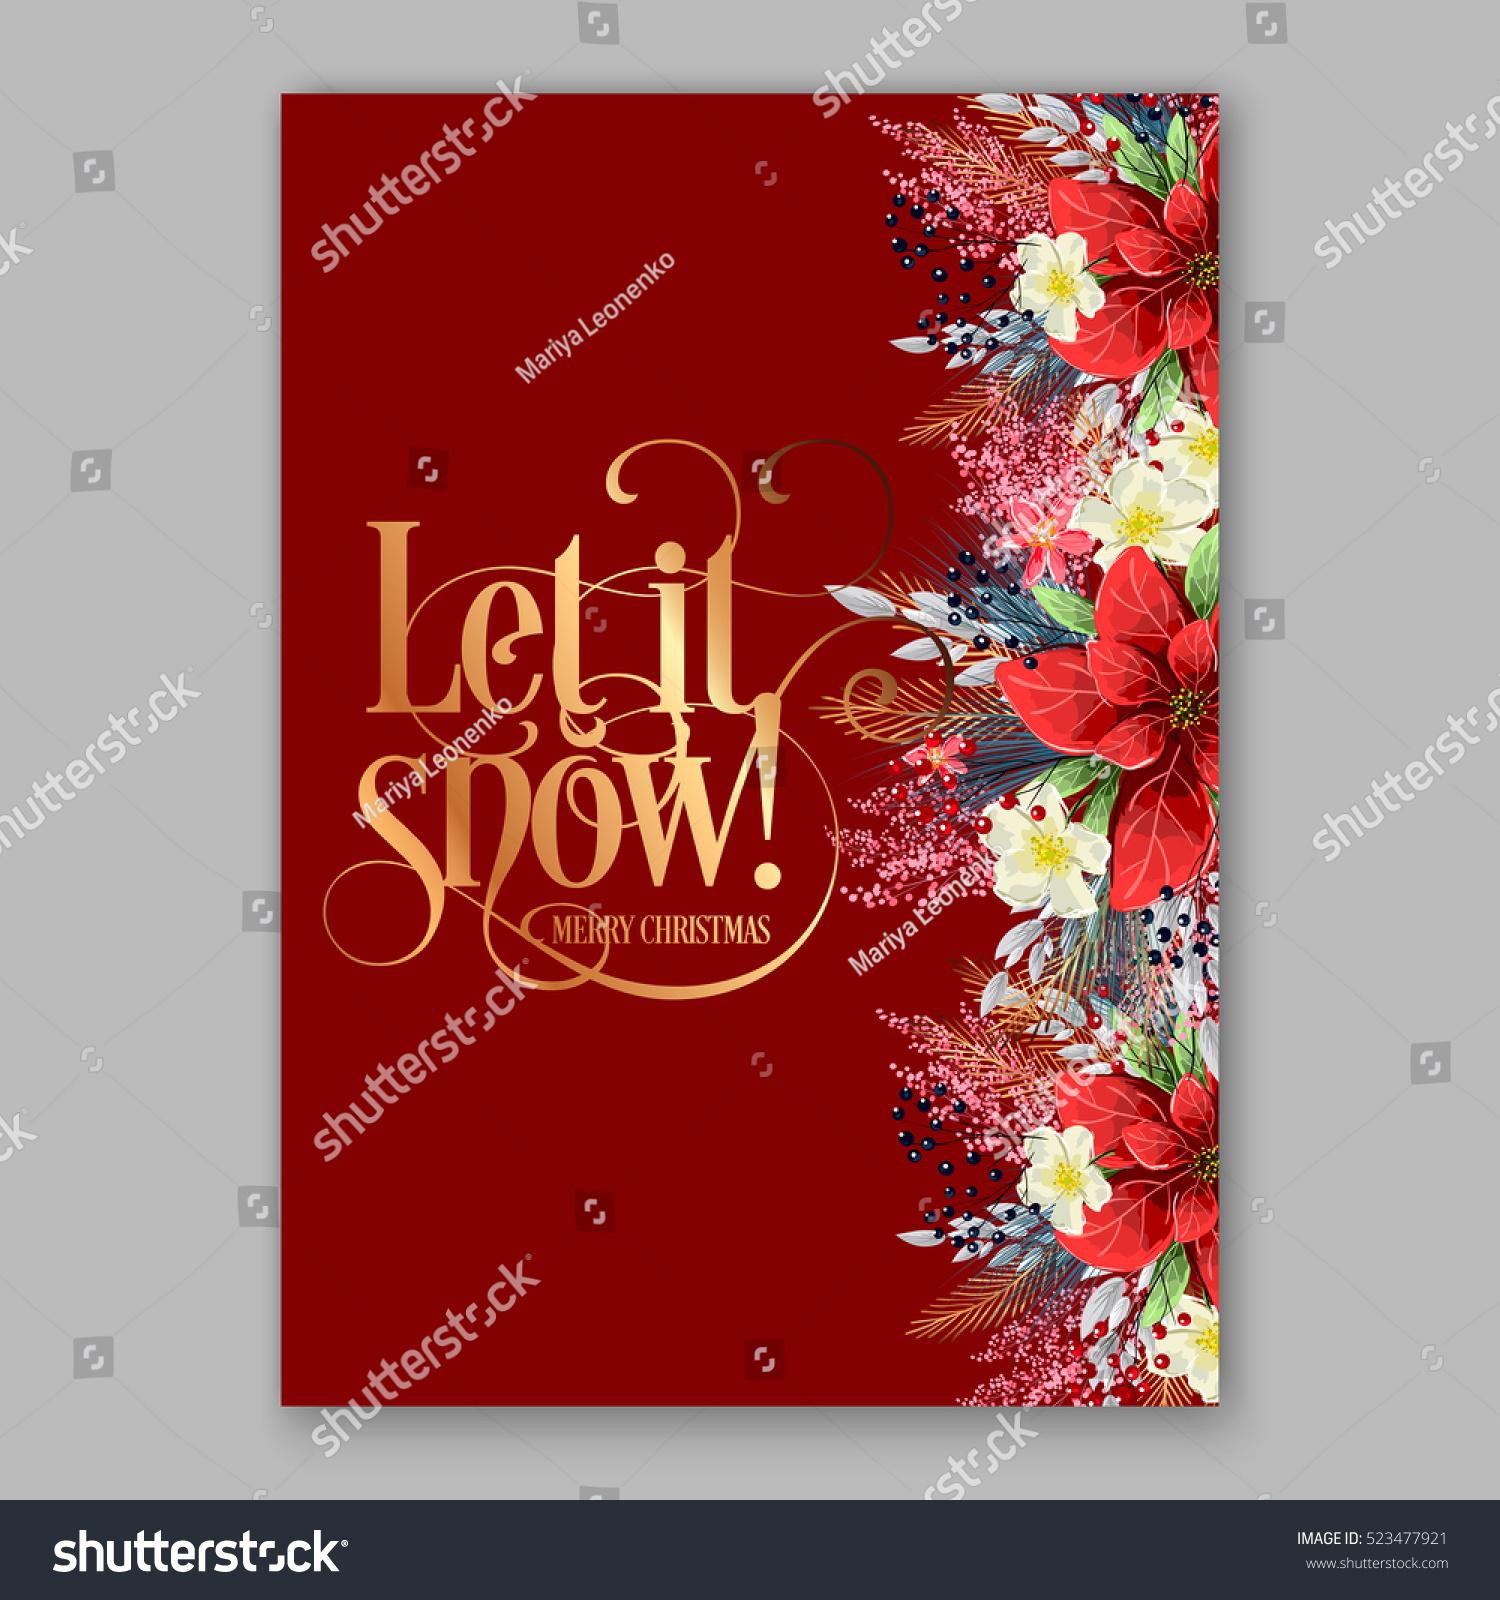 Poinsettia Christmas Party Invitation Sample Card Stock Photo (Photo ...